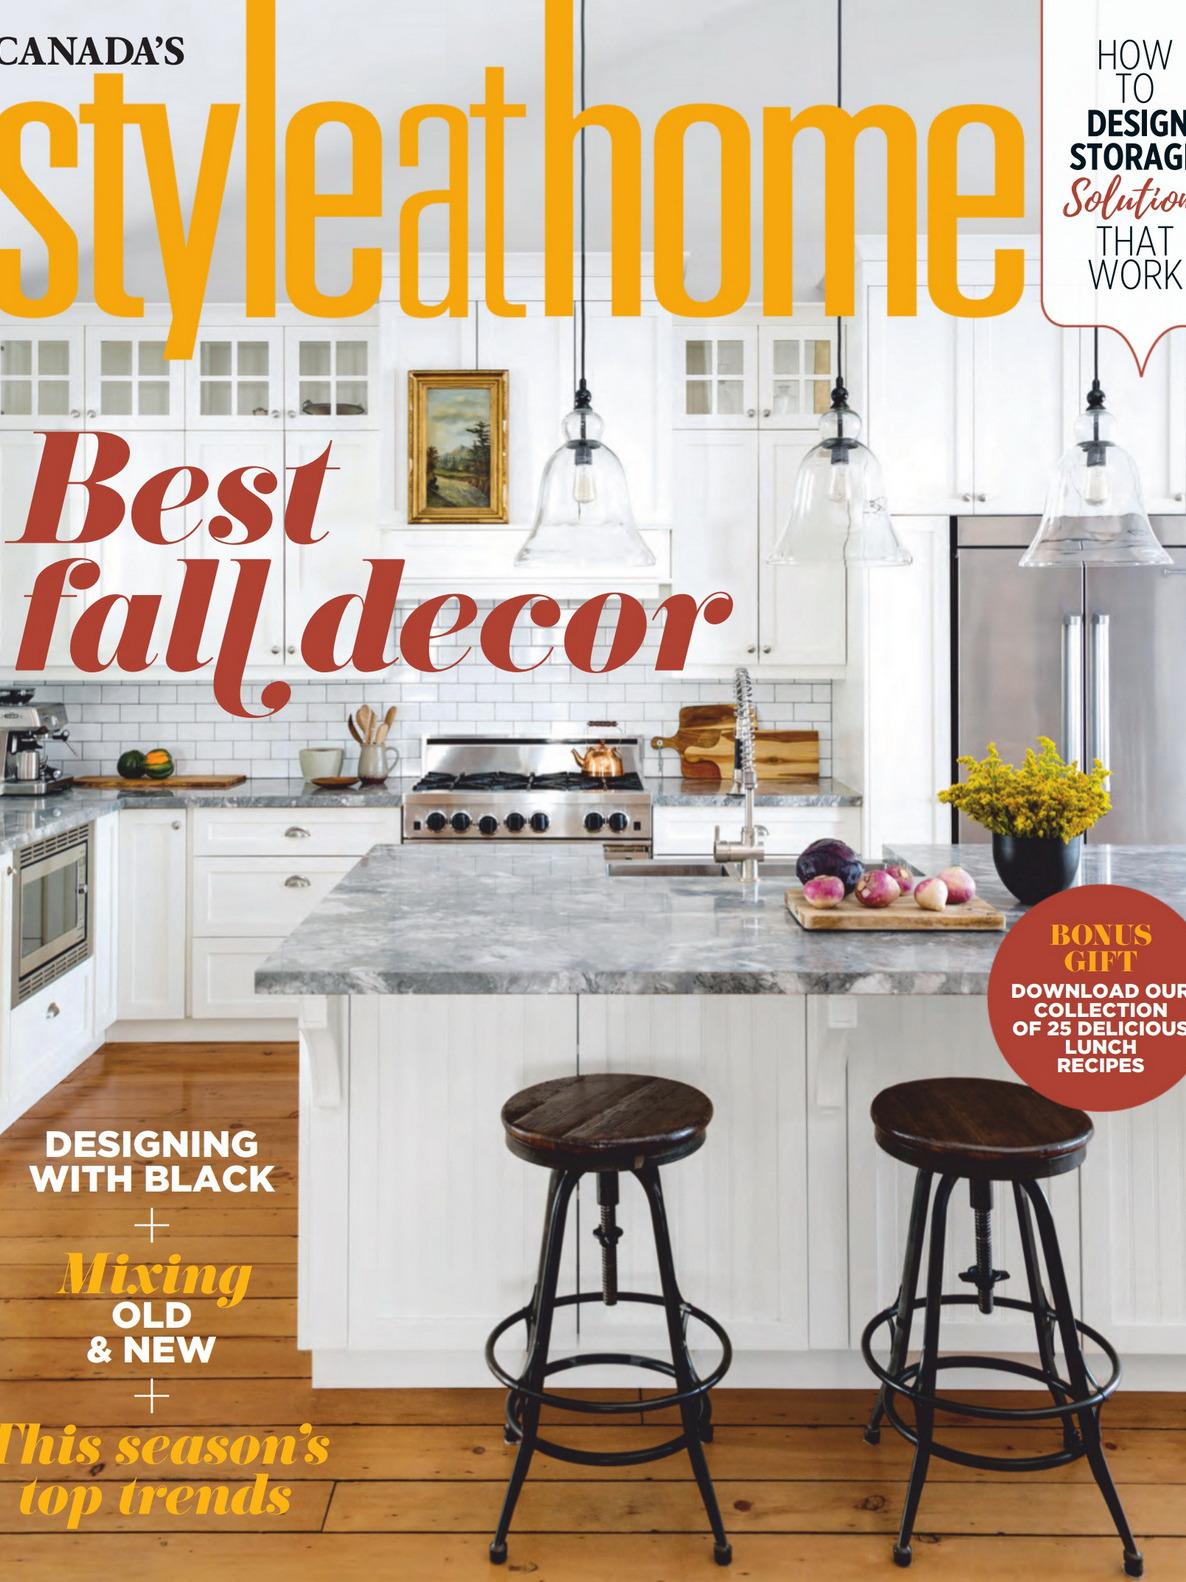 《Style at Home》加拿大版时尚家居杂志2020年10月号